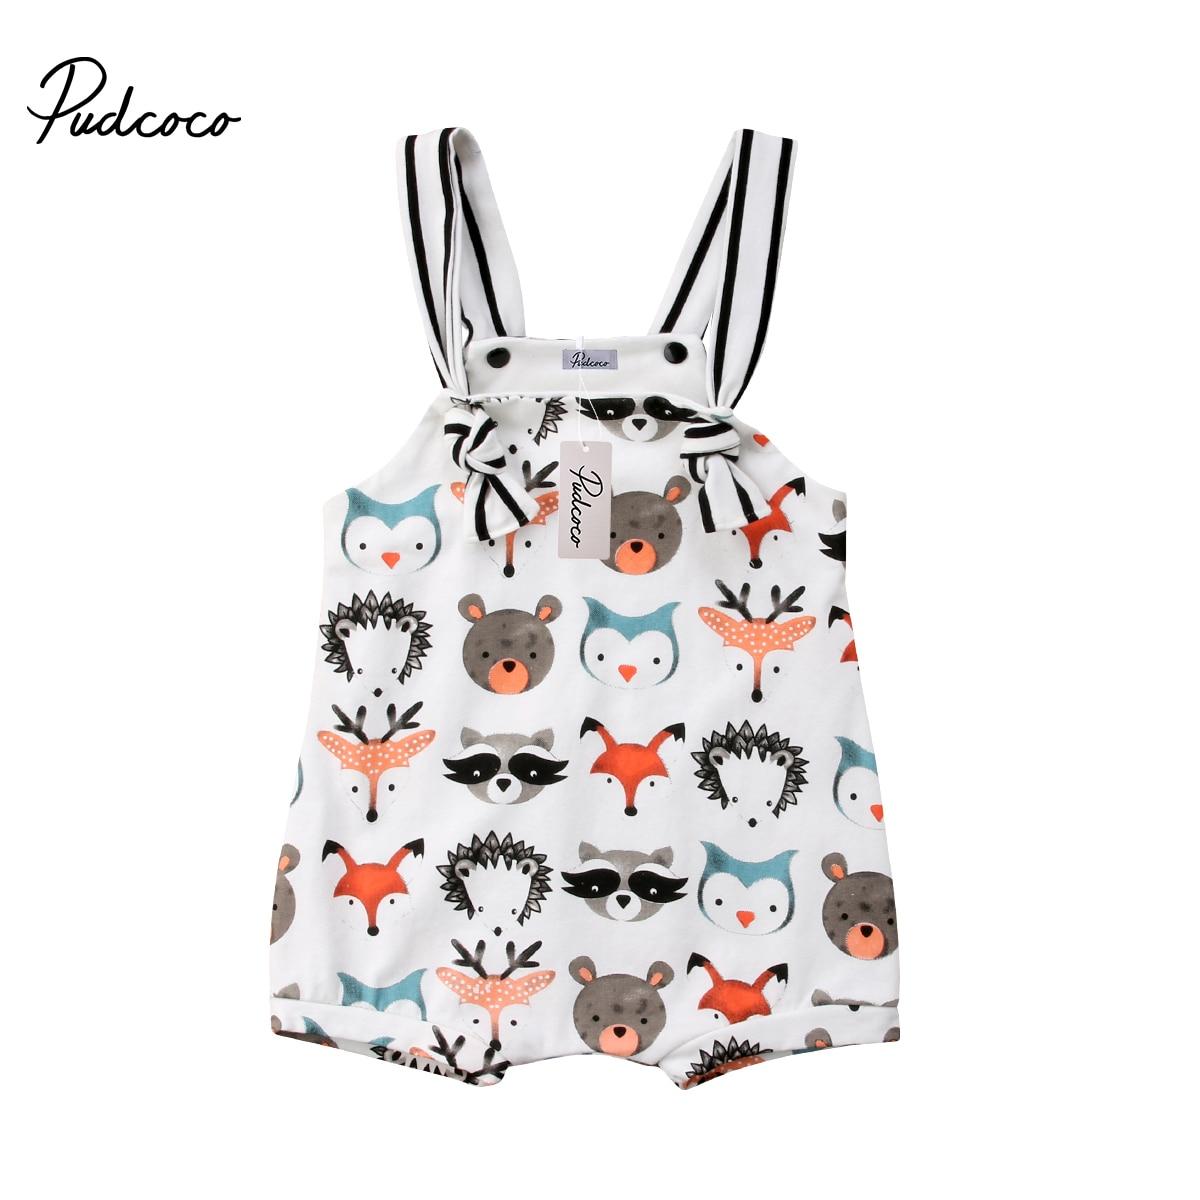 2018 Brand New Summer Toddler Infant Newborn Baby Girls Boys Romper 0-24M Sleeveless Cartoon Animal Jumpsuits Sunsuit Playsuit